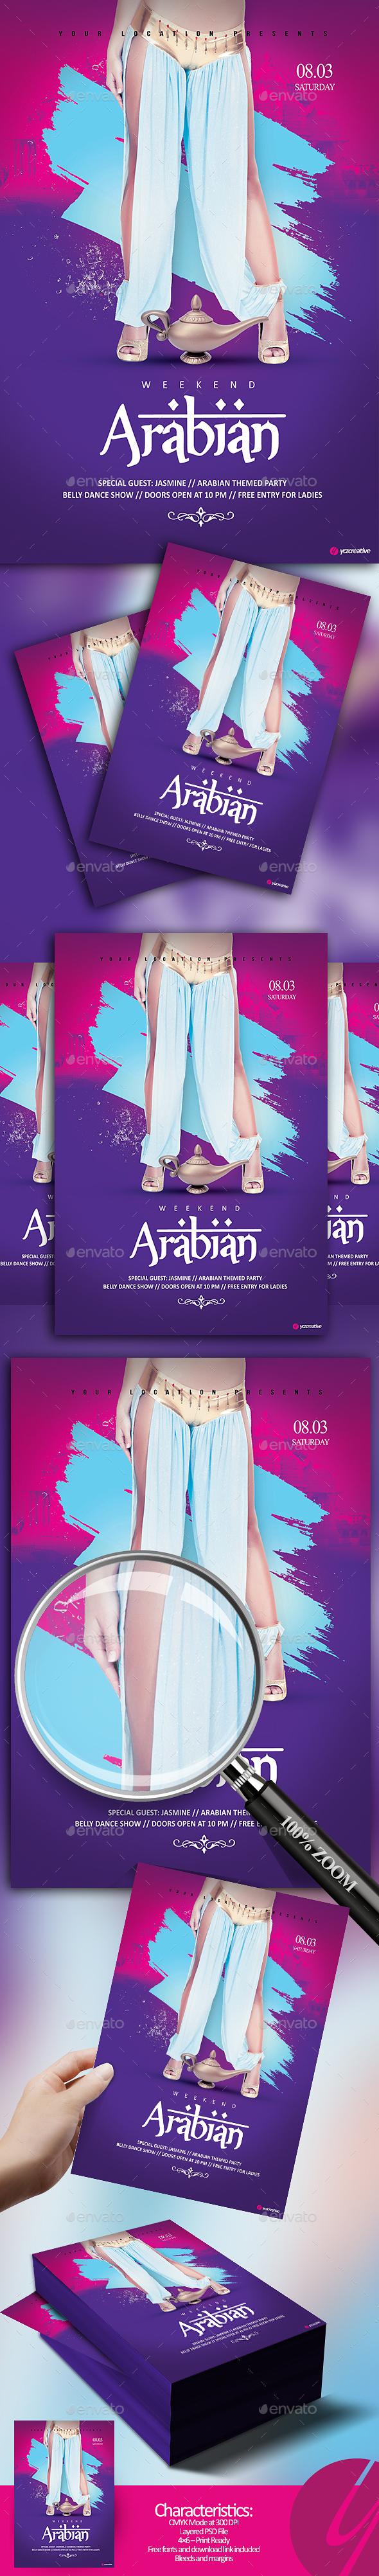 Arabian Weekend Flyer - Clubs & Parties Events